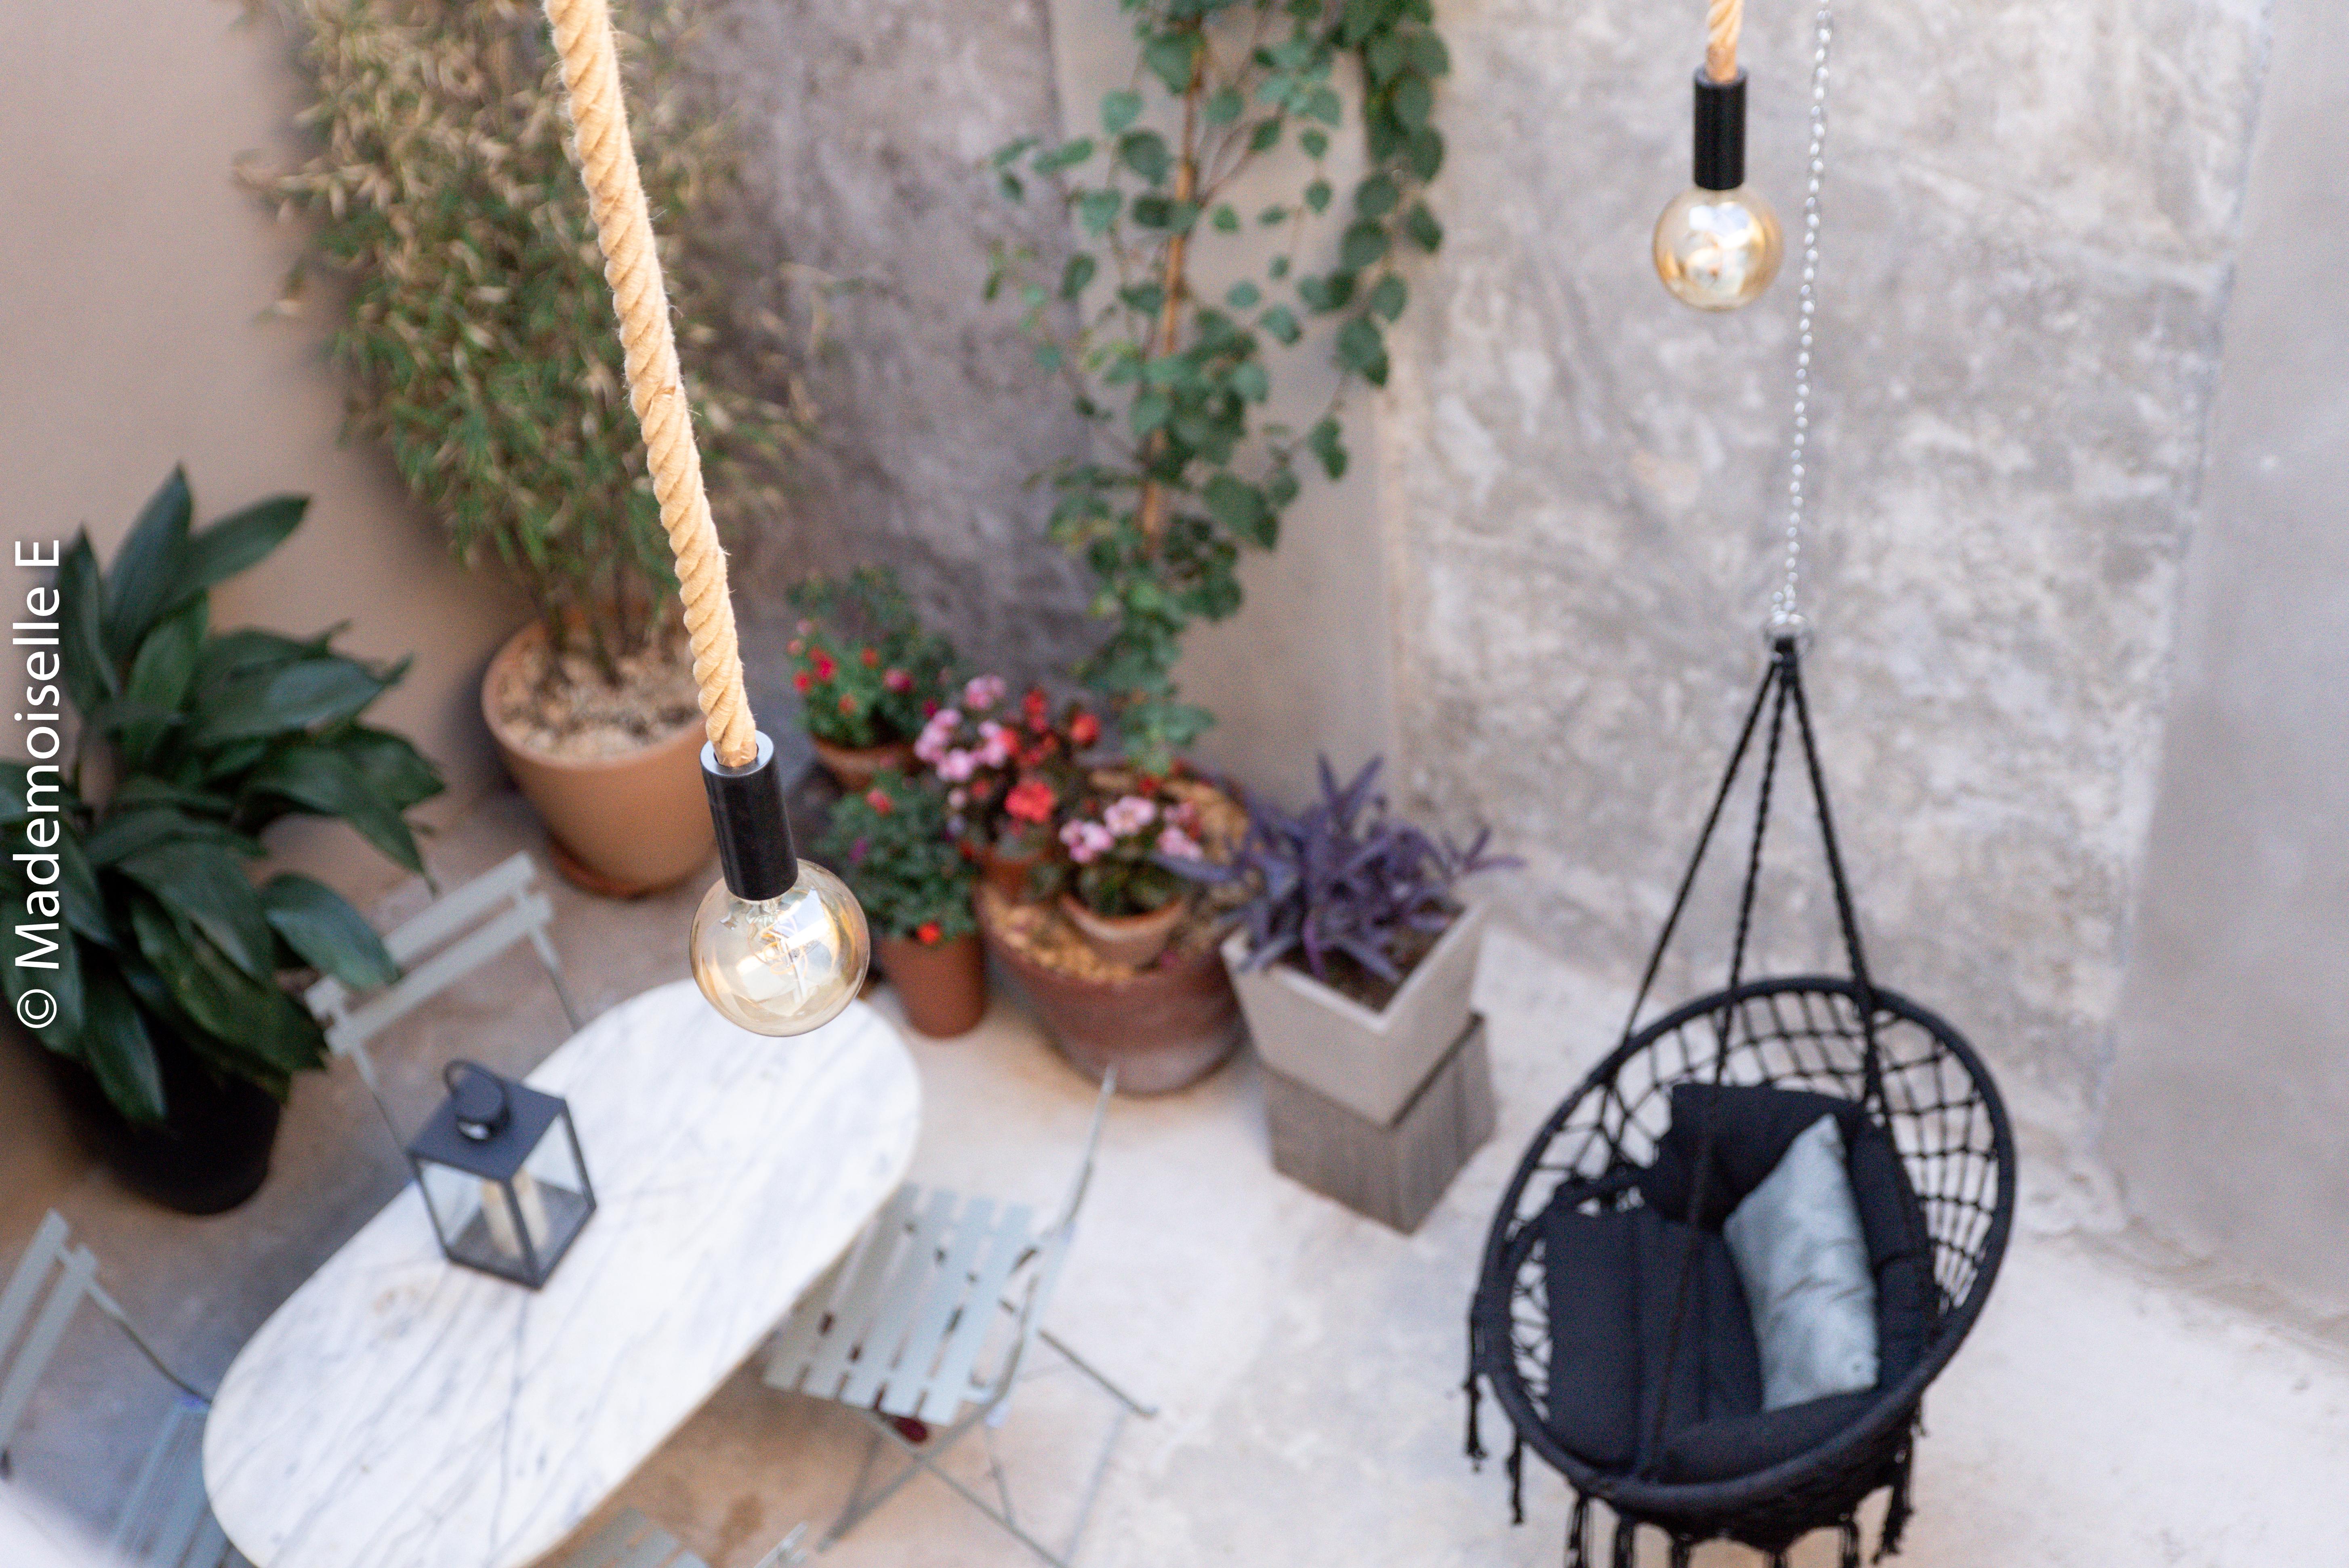 5-conseils-pour-amenager-sa-terrasse-6-mademoiselle-e